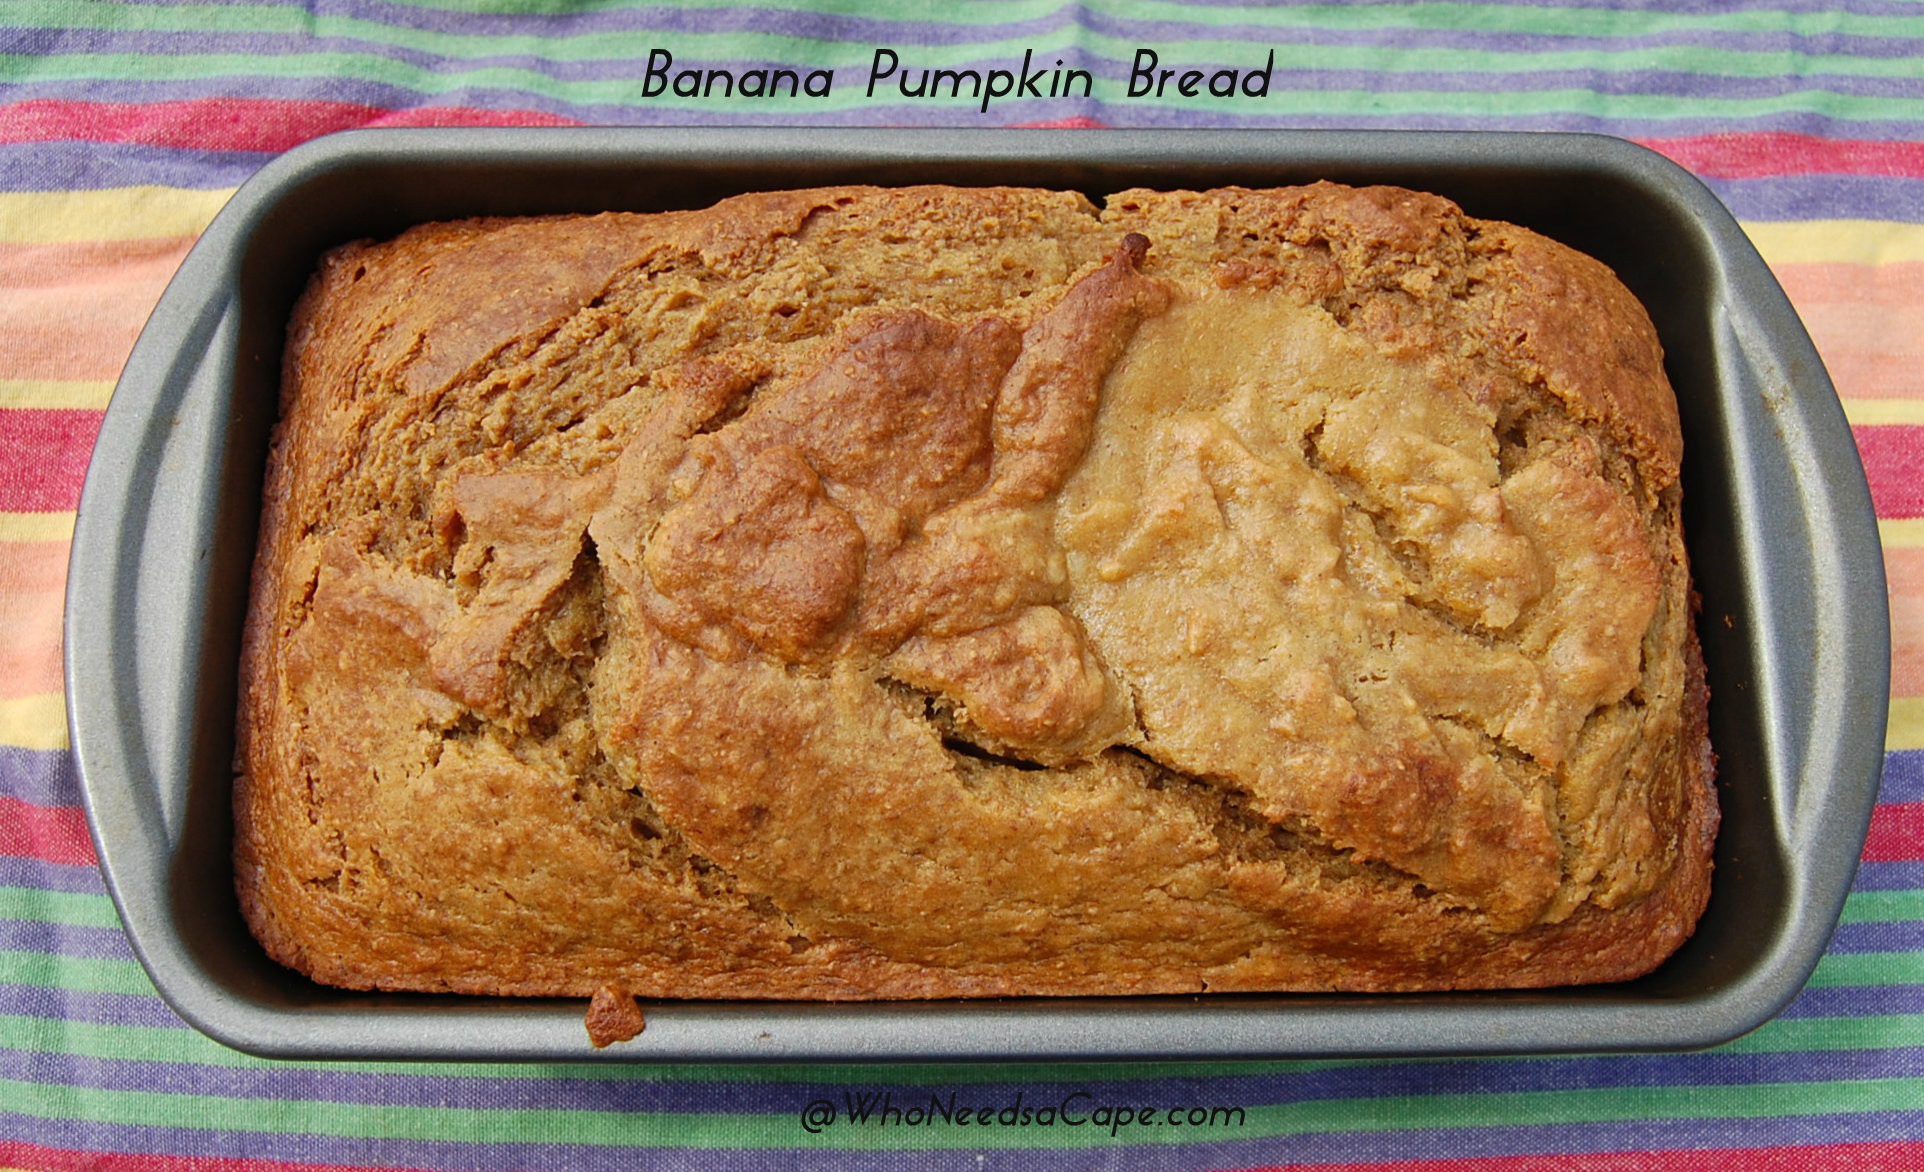 Banana Pumpkin Bread  Banana Pumpkin Bread Who Needs A Cape